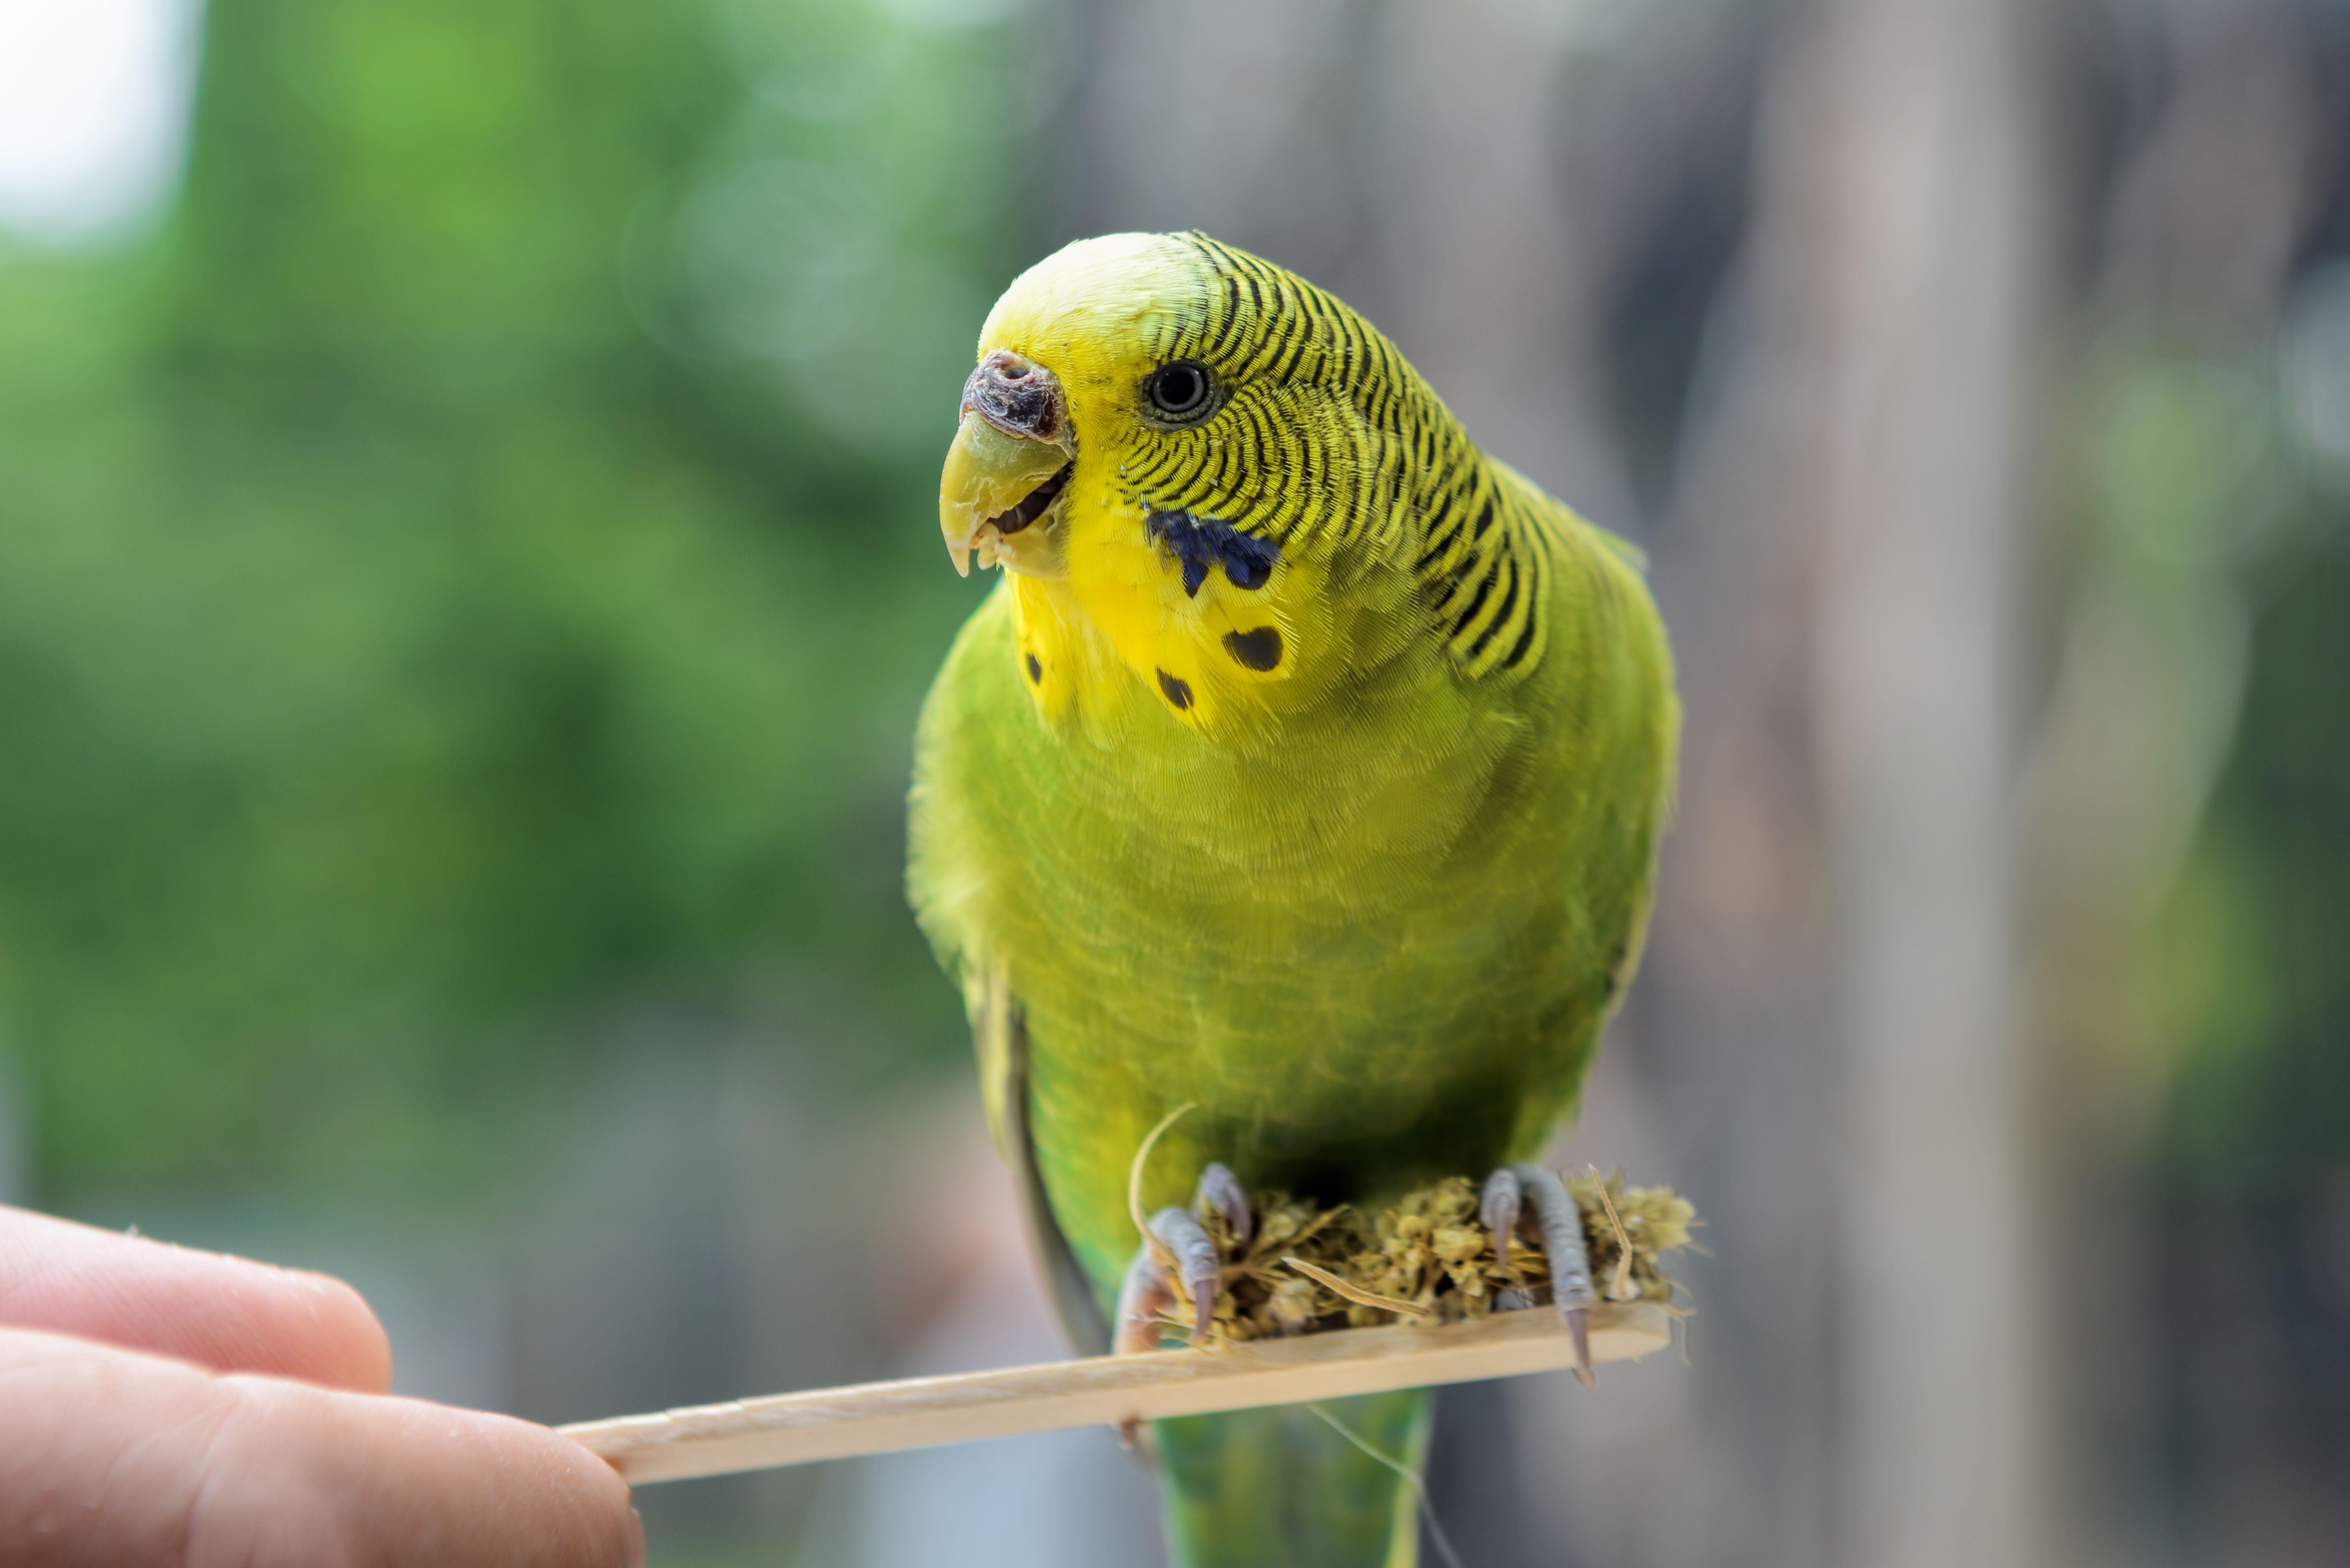 Green parakeet perched